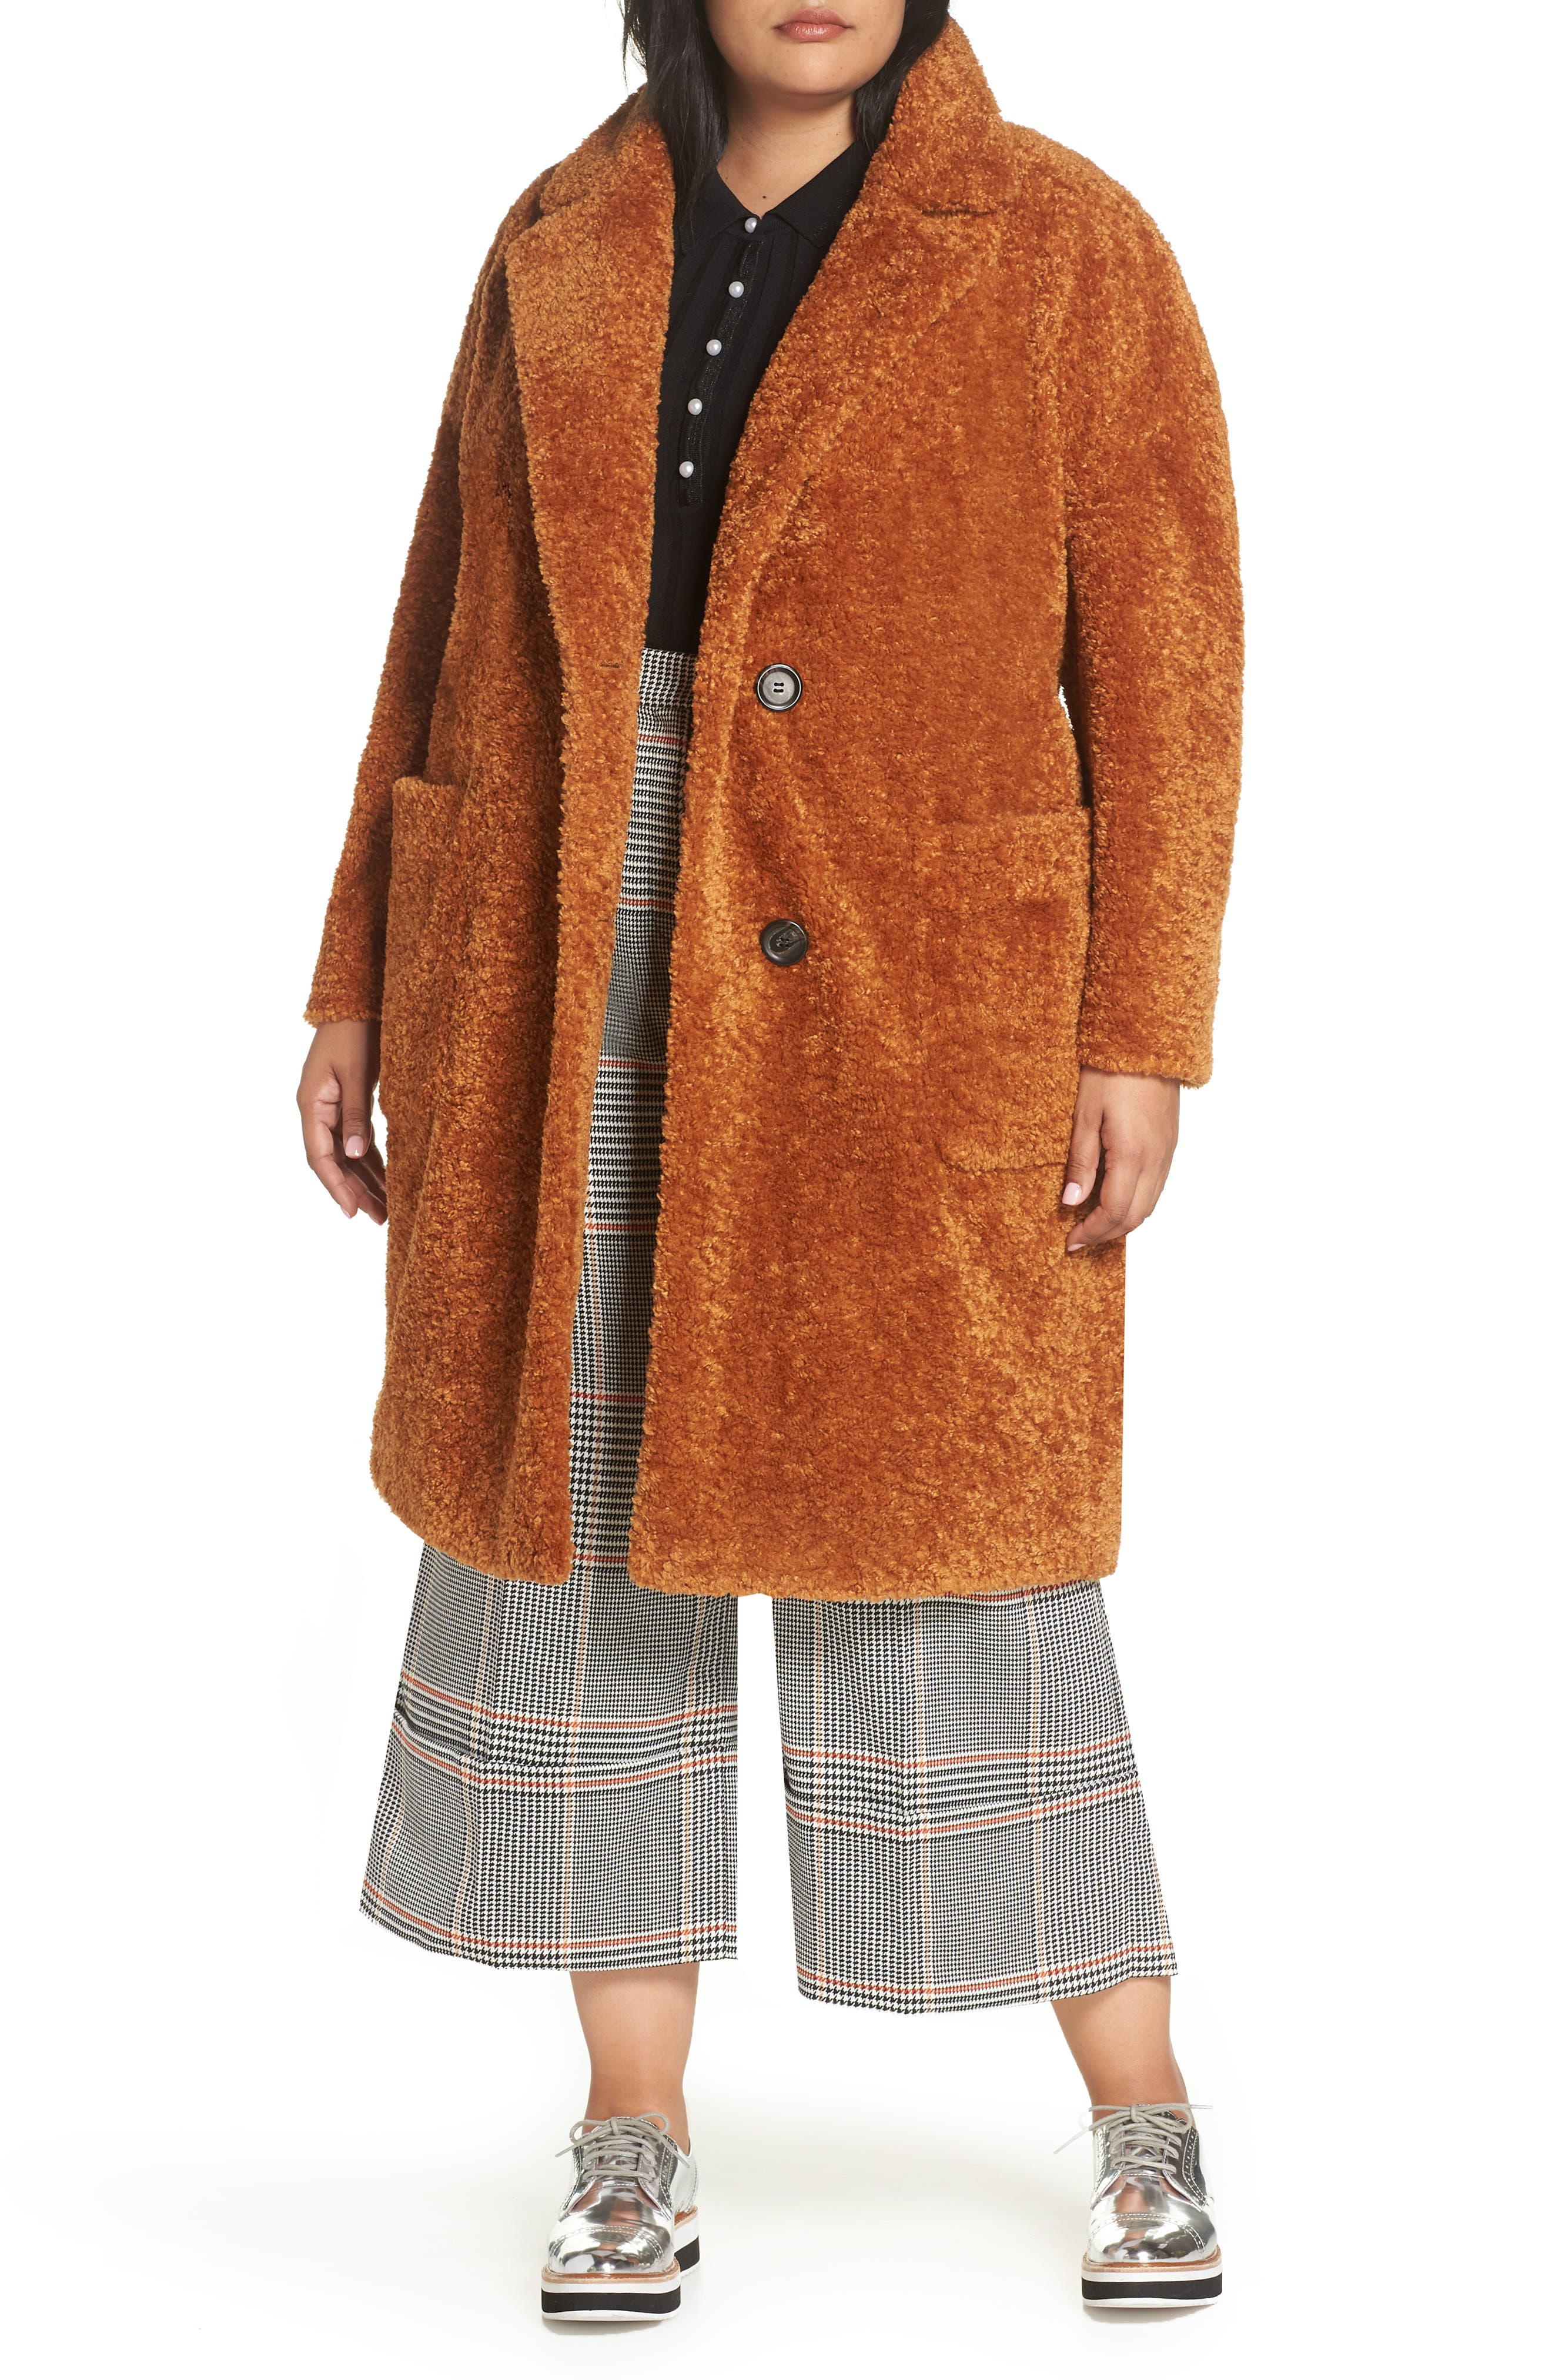 x Atlantic-Pacific Faux Fur Coat,                         Main,                         color, 219